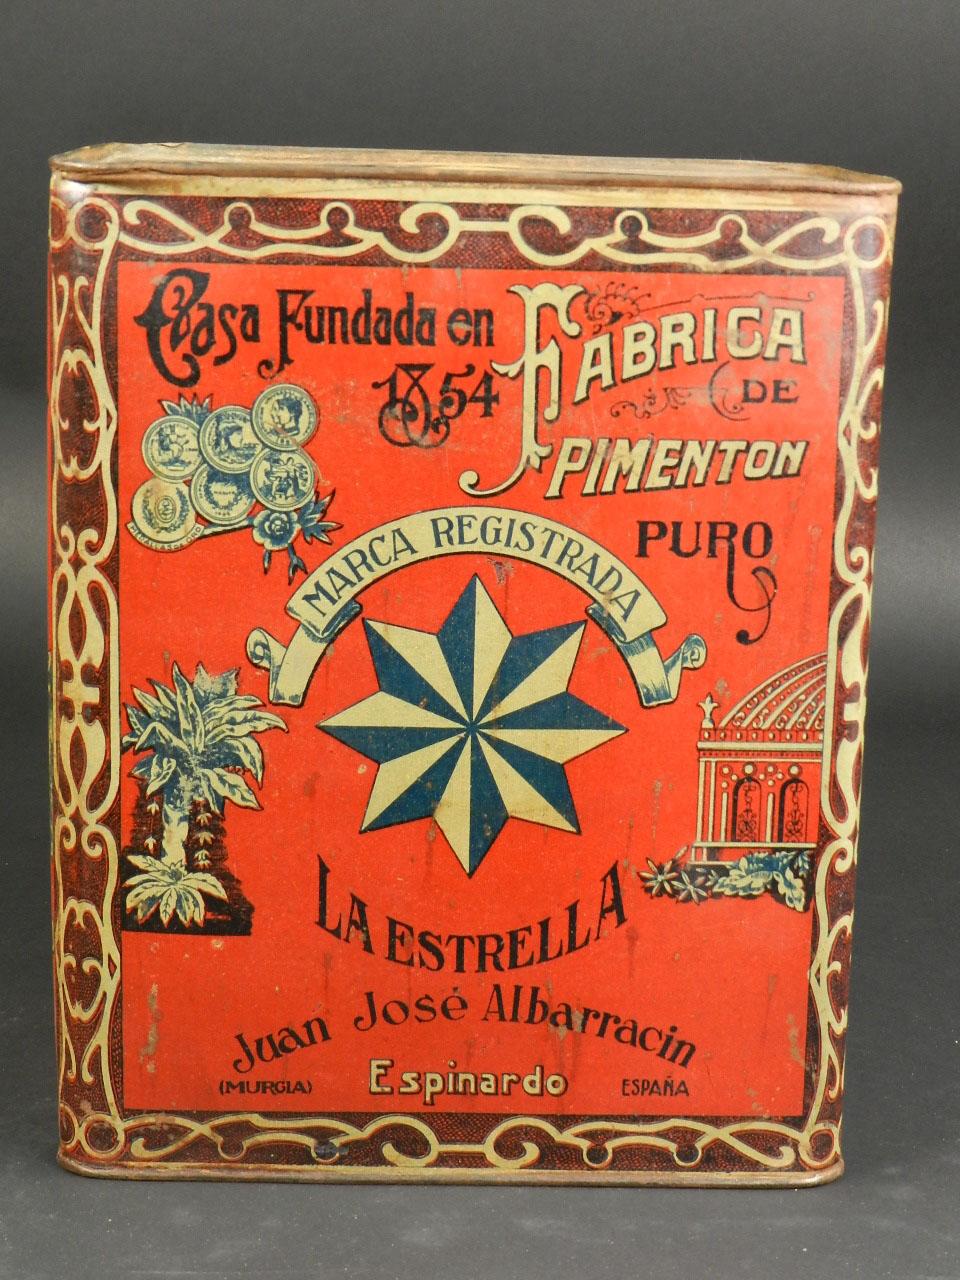 Imagen LATA DE PIMENTON LA ESTRELLA, MURCIA AÑO 1920 24655